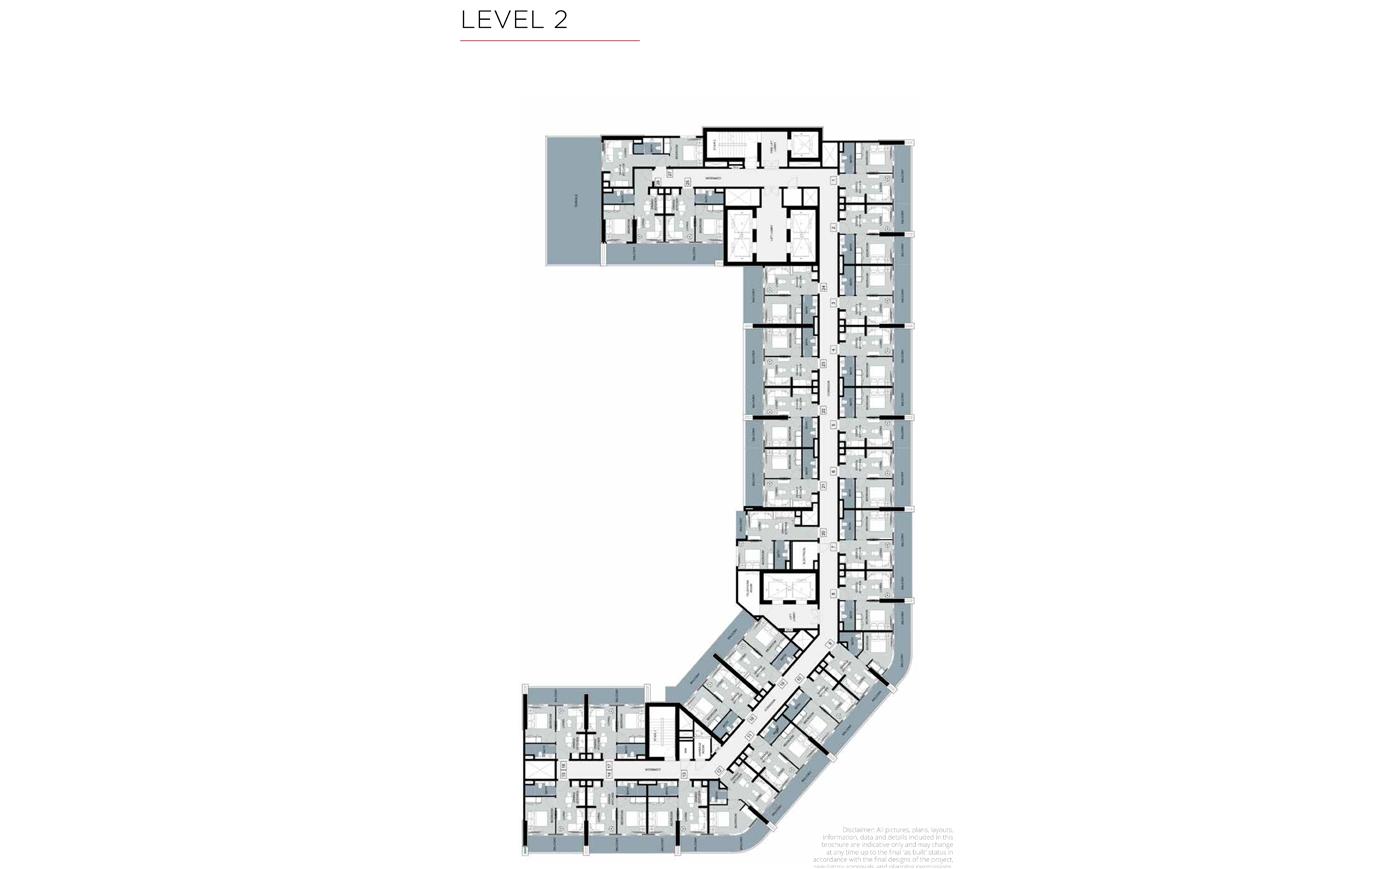 Typical Floor, Level 2